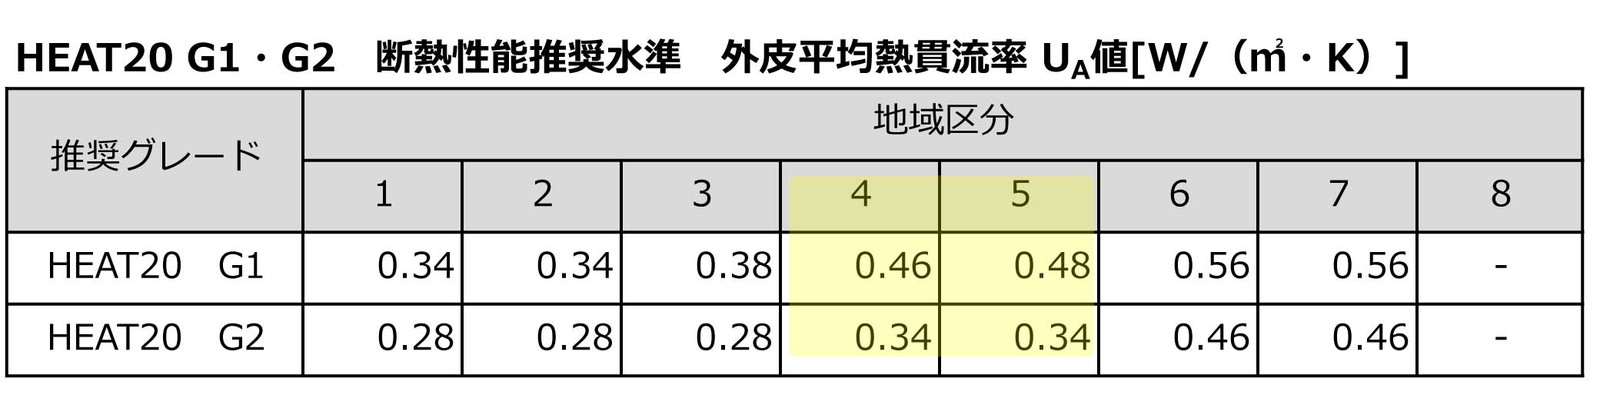 Heat20_g1g2_grade_20151204